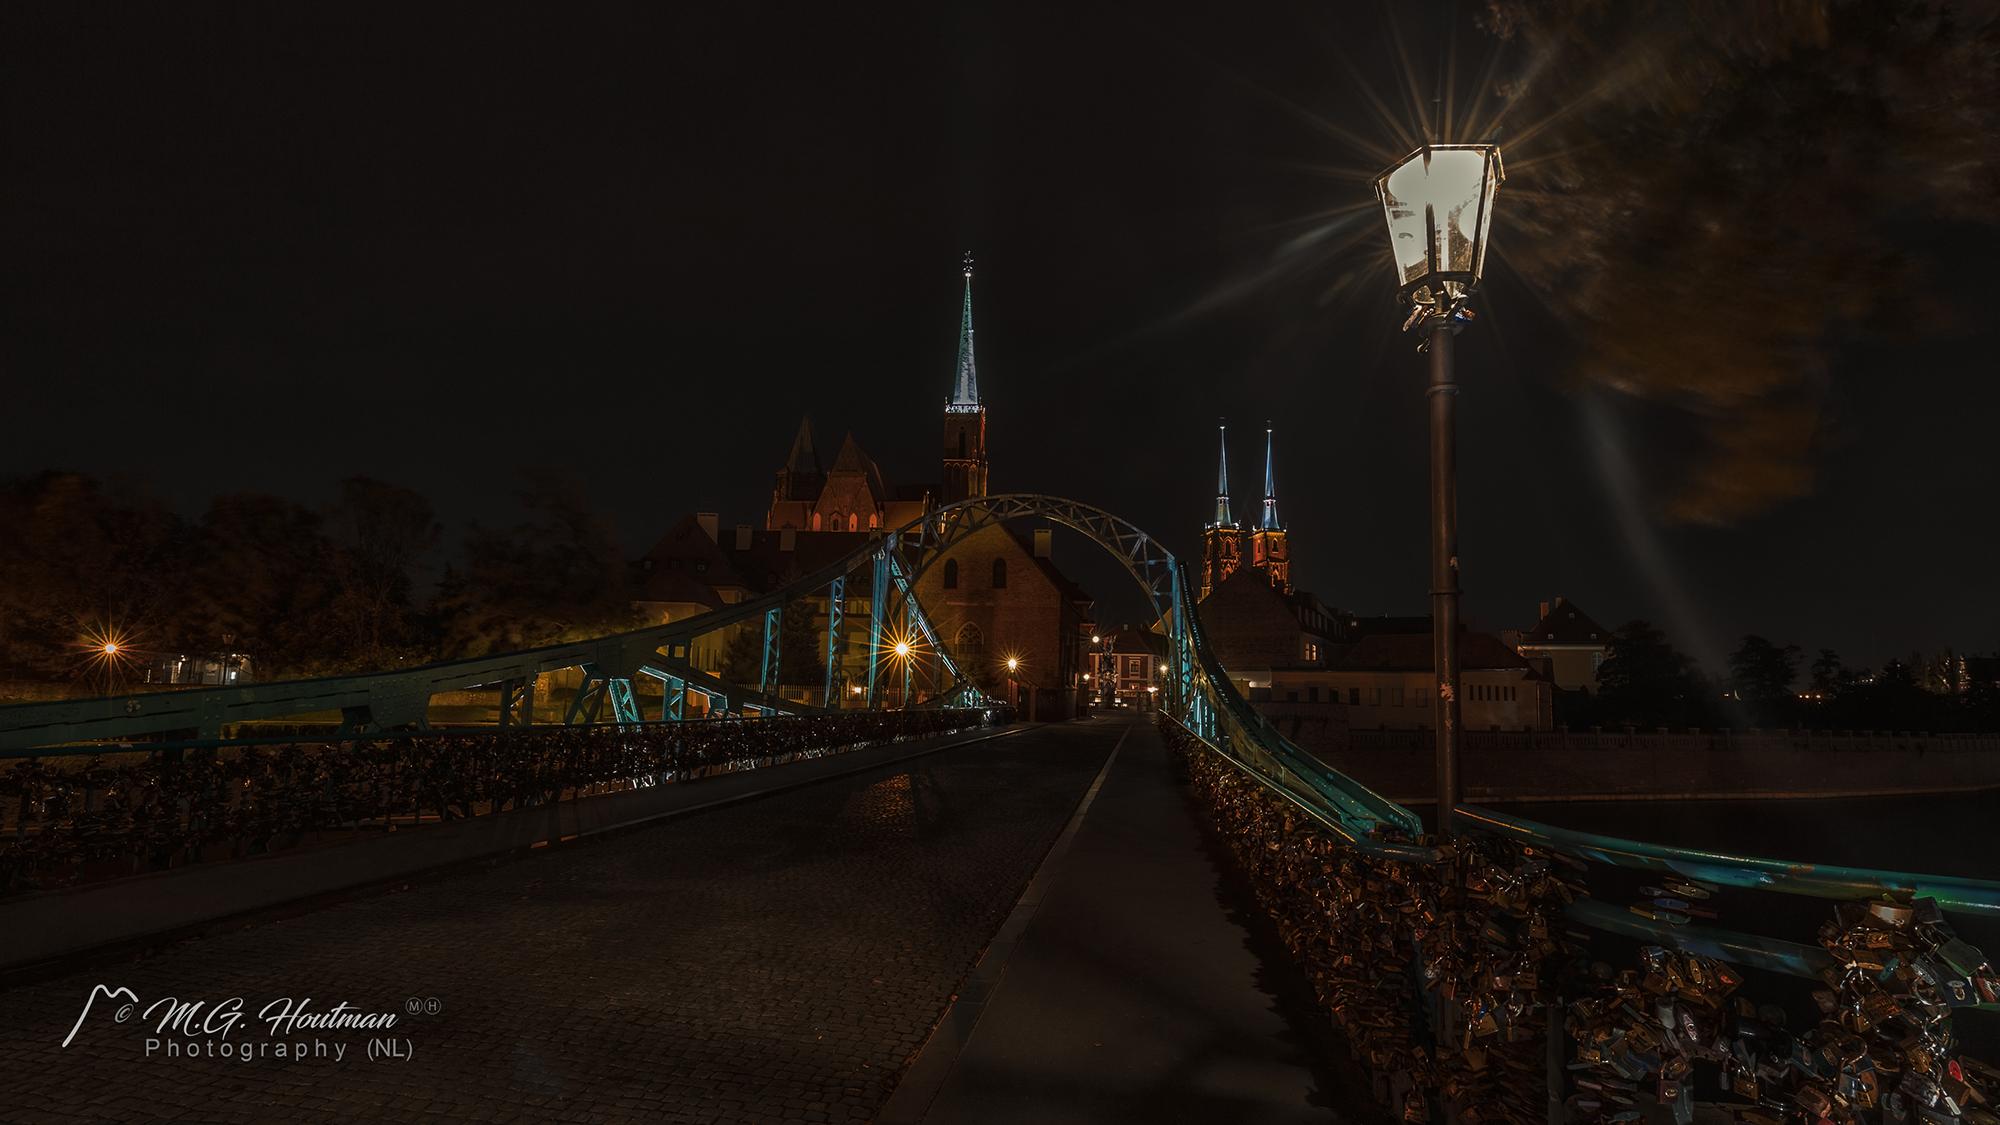 Tumski - Wroclaw, Poland